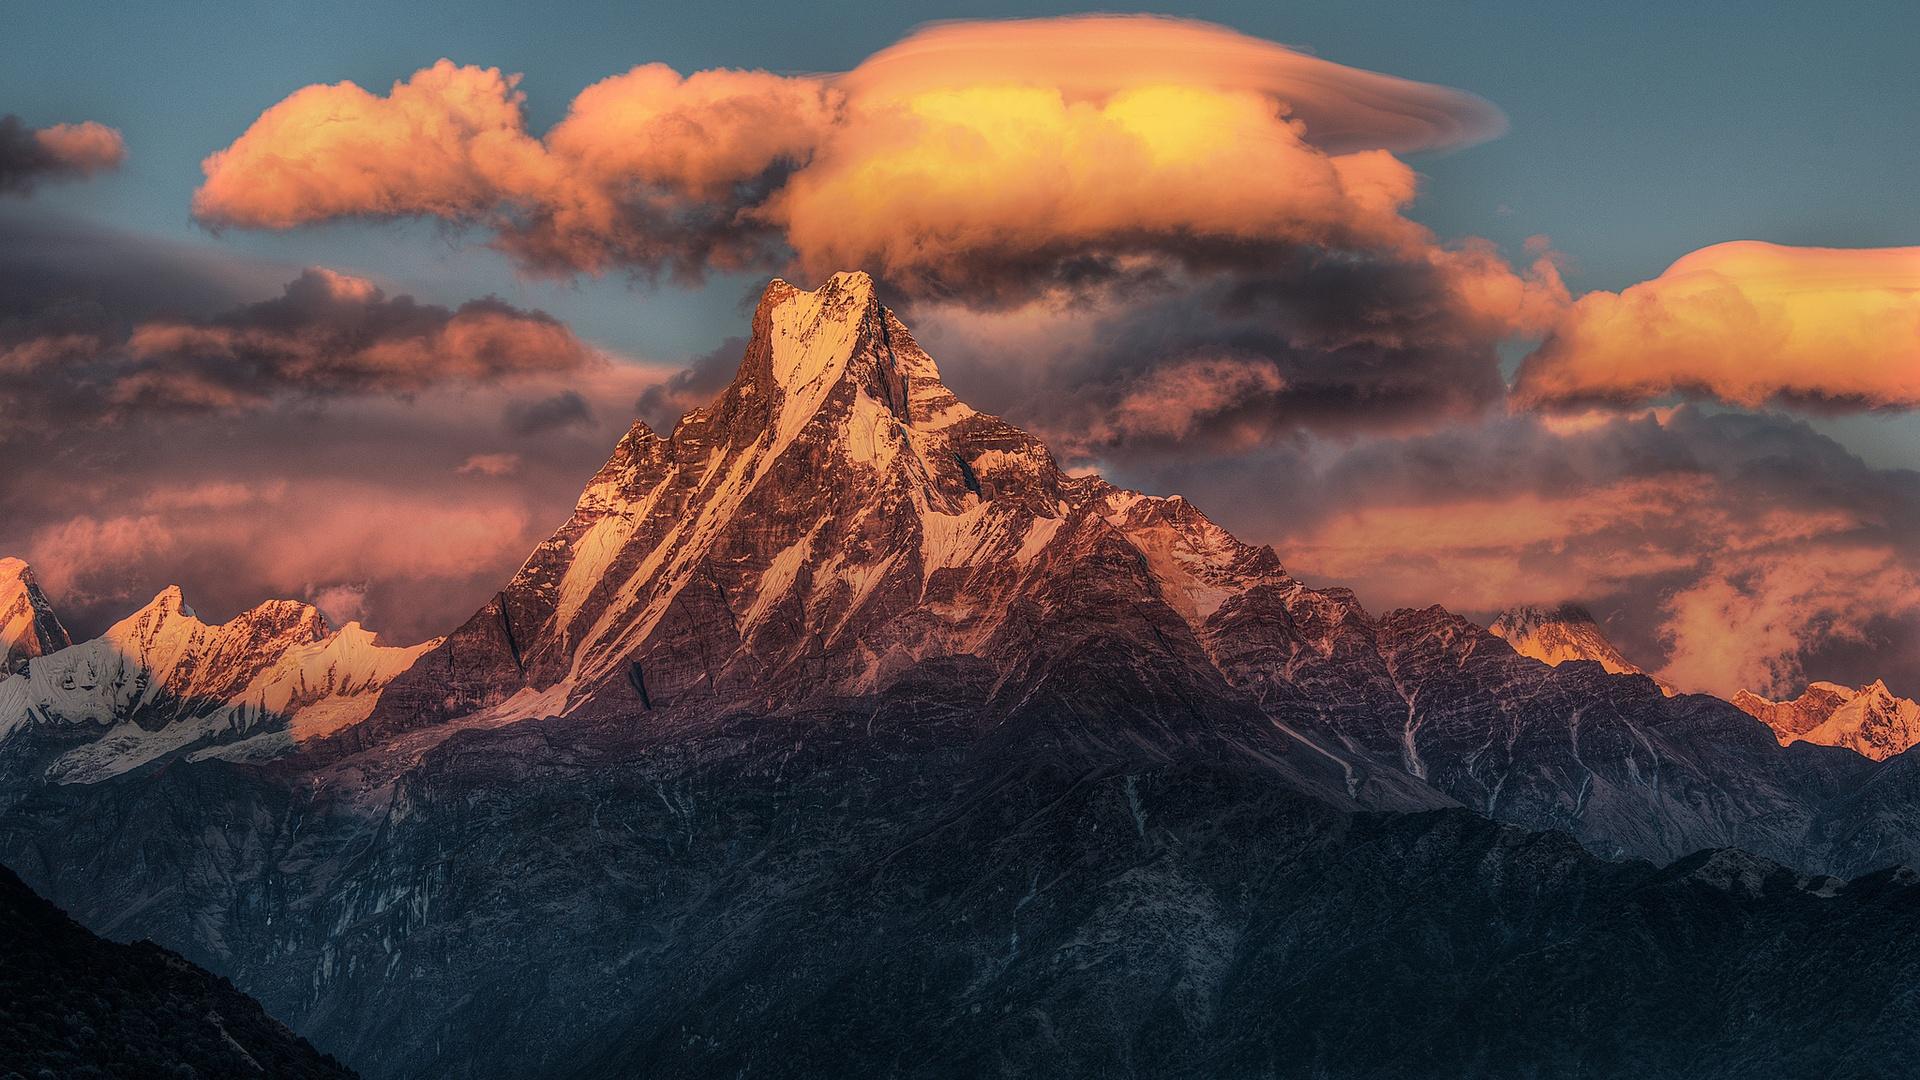 Himalayas Hills Wallpapers   1920x1080   894781 1920x1080